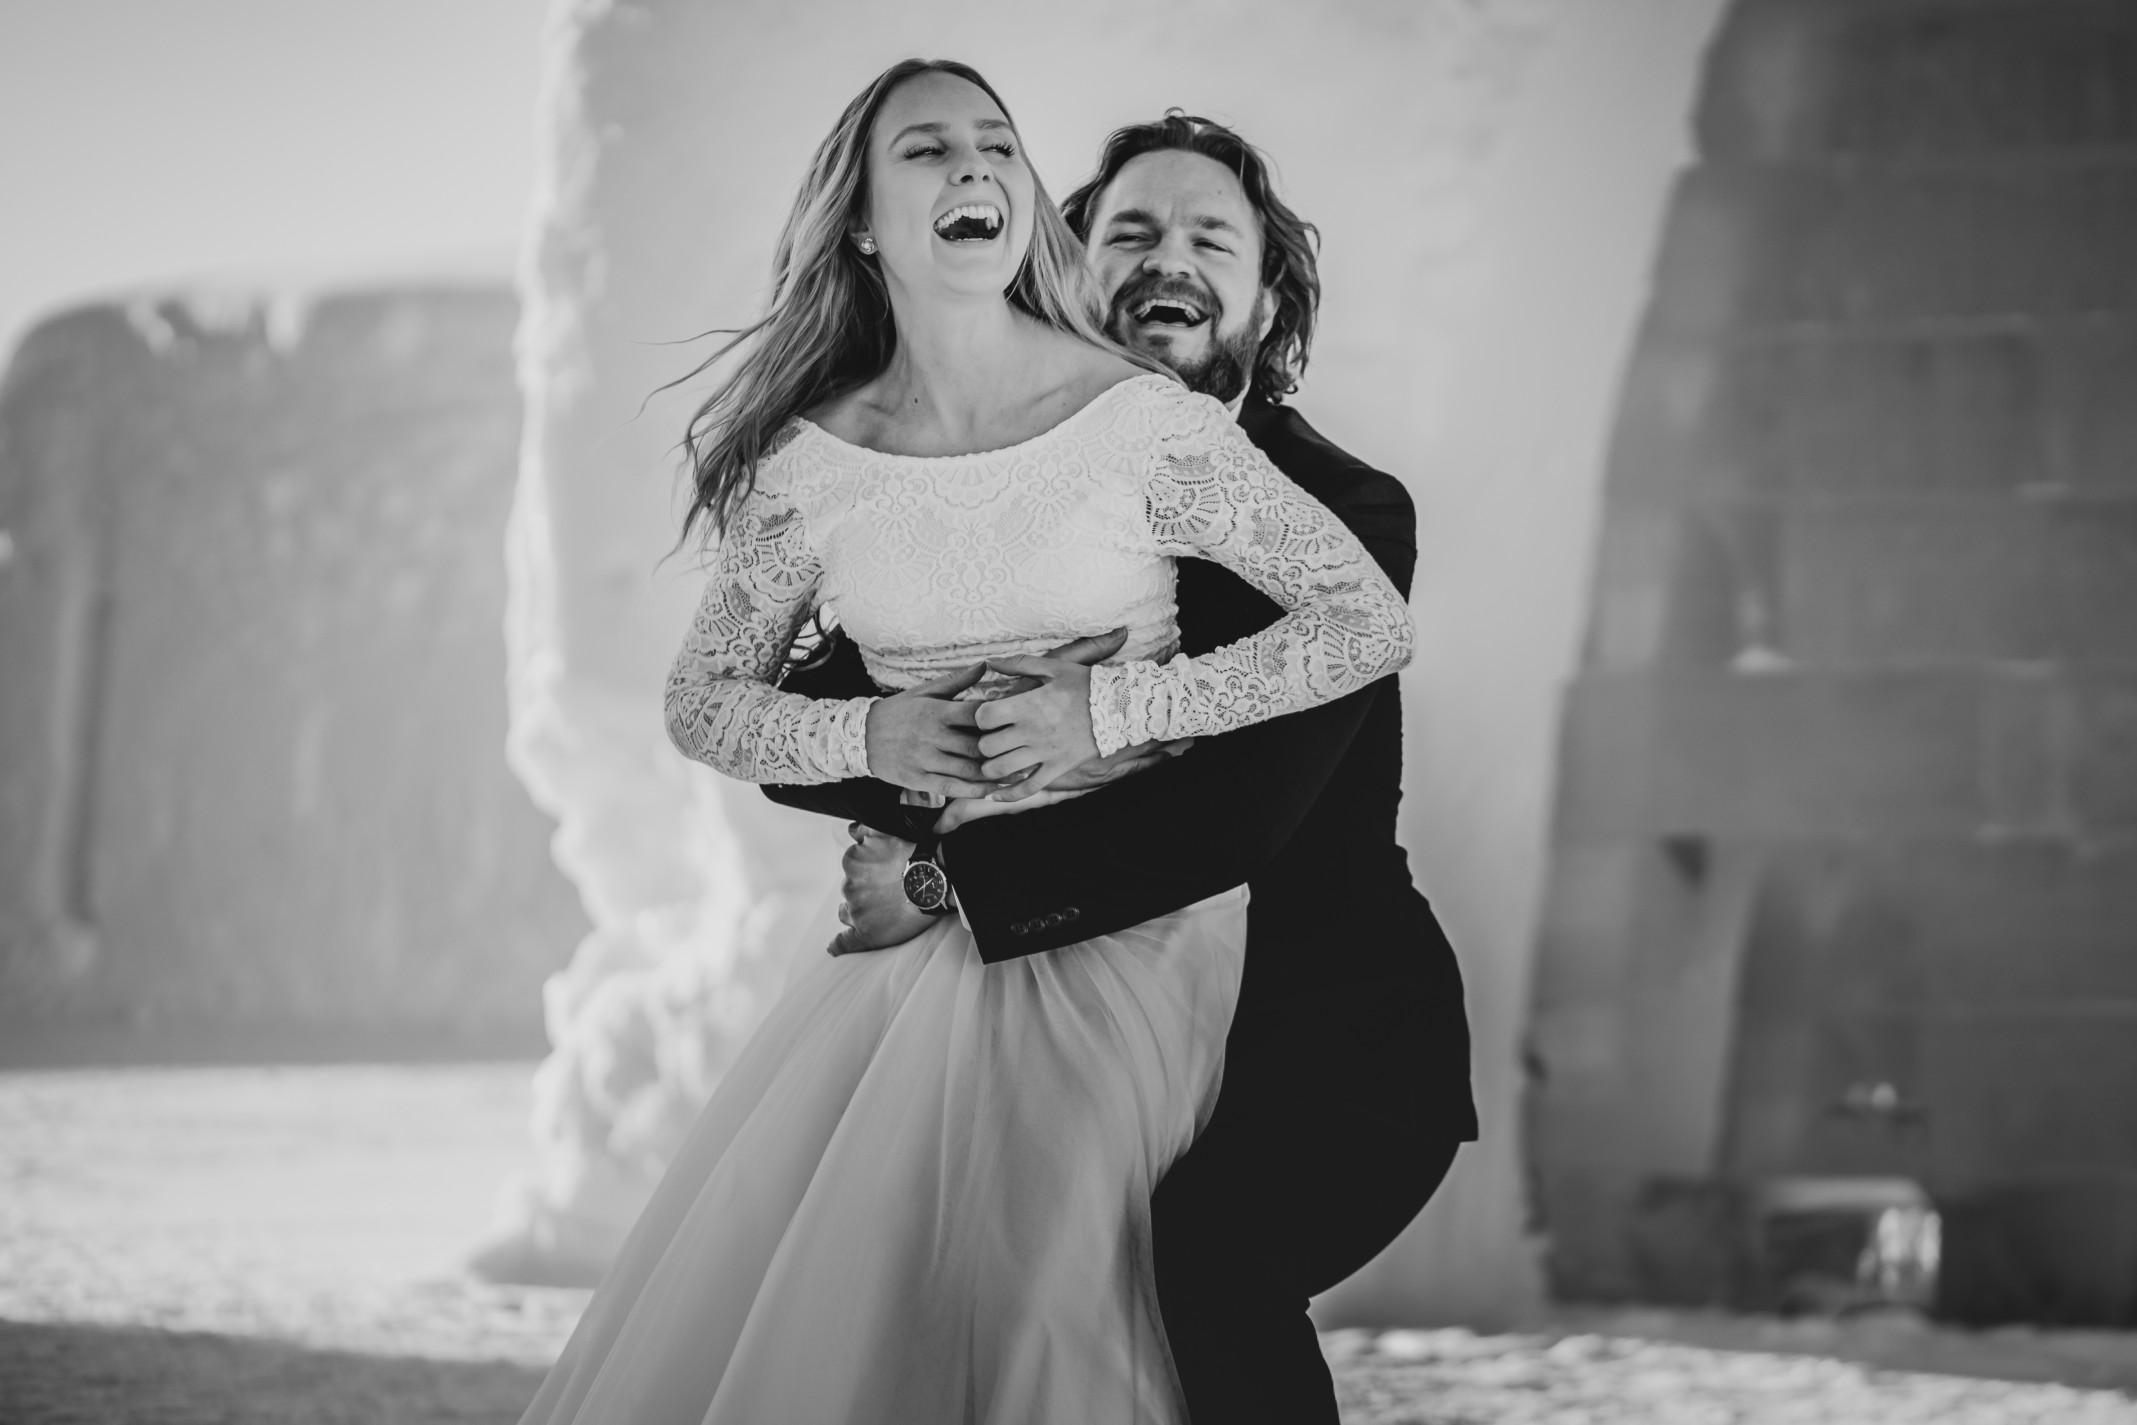 winter wedding at icehotel sweden - cinematic wedding photography - ice wedding - elopement in sweden - creative wedding photographer - unconventional wedding - alternative wedding - unique wedding - artistic wedding -2